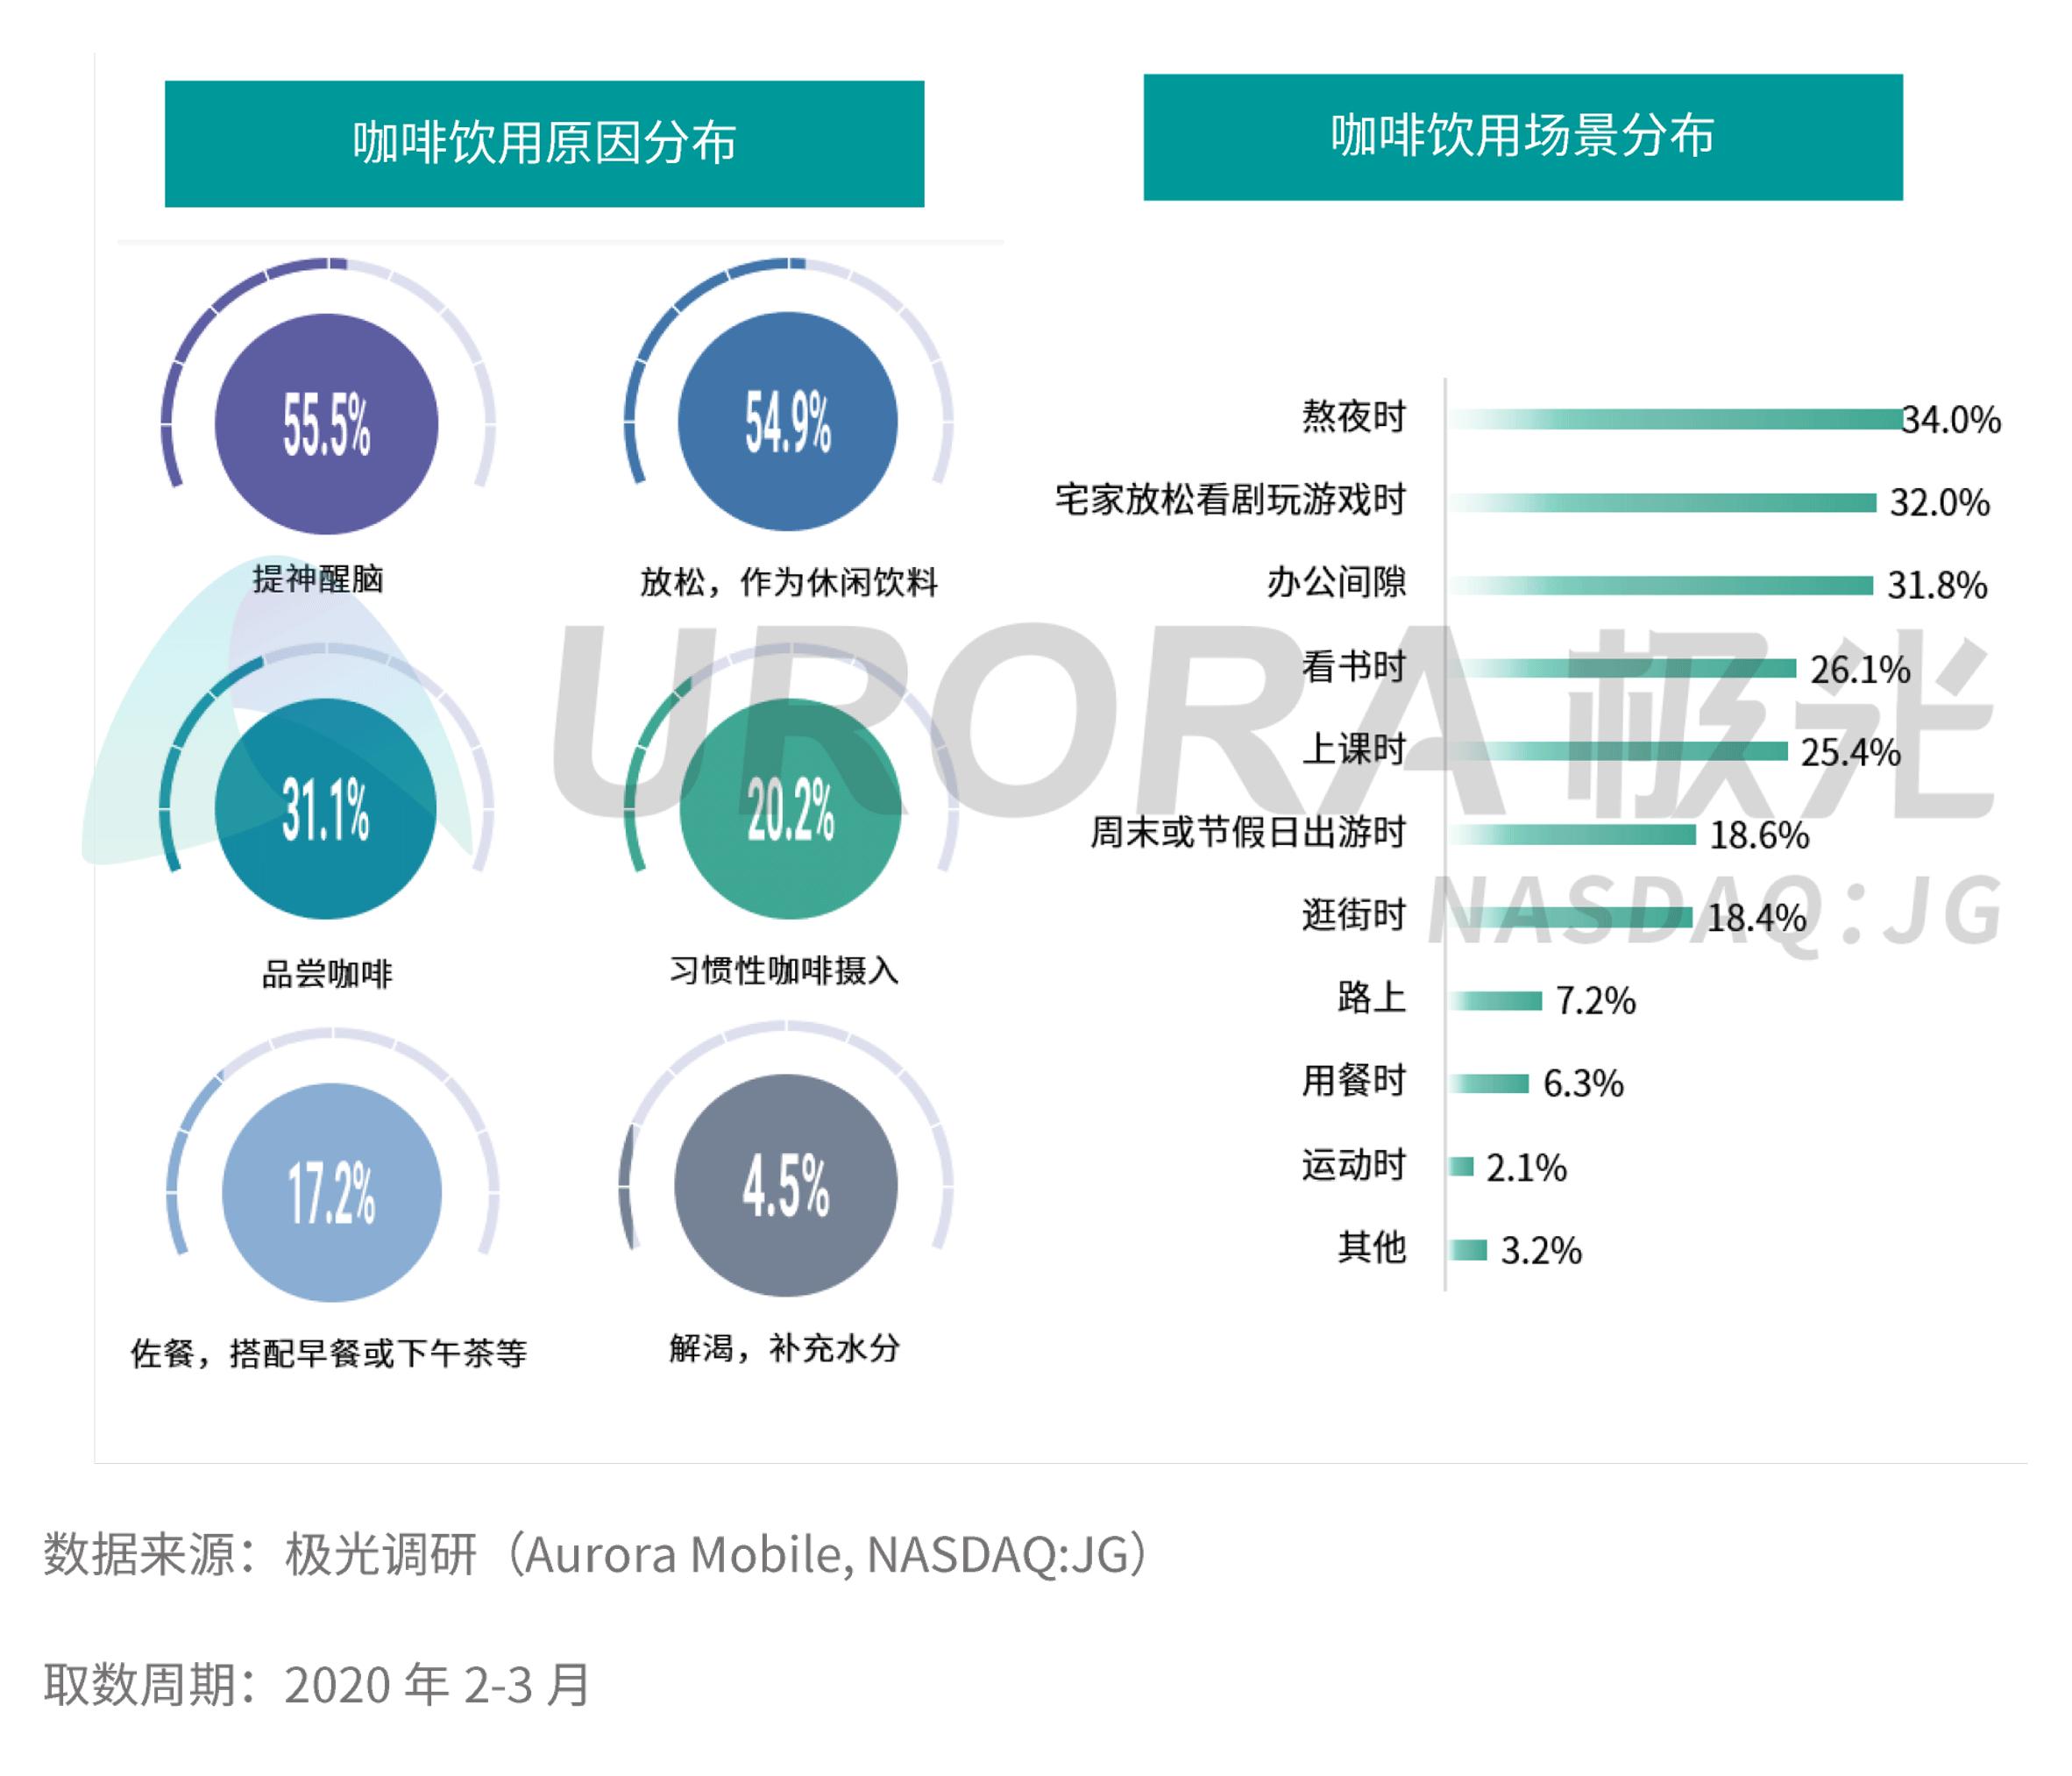 JIGUANG-疫情下中国咖啡消费市场洞察报告【定稿】pp-8.png